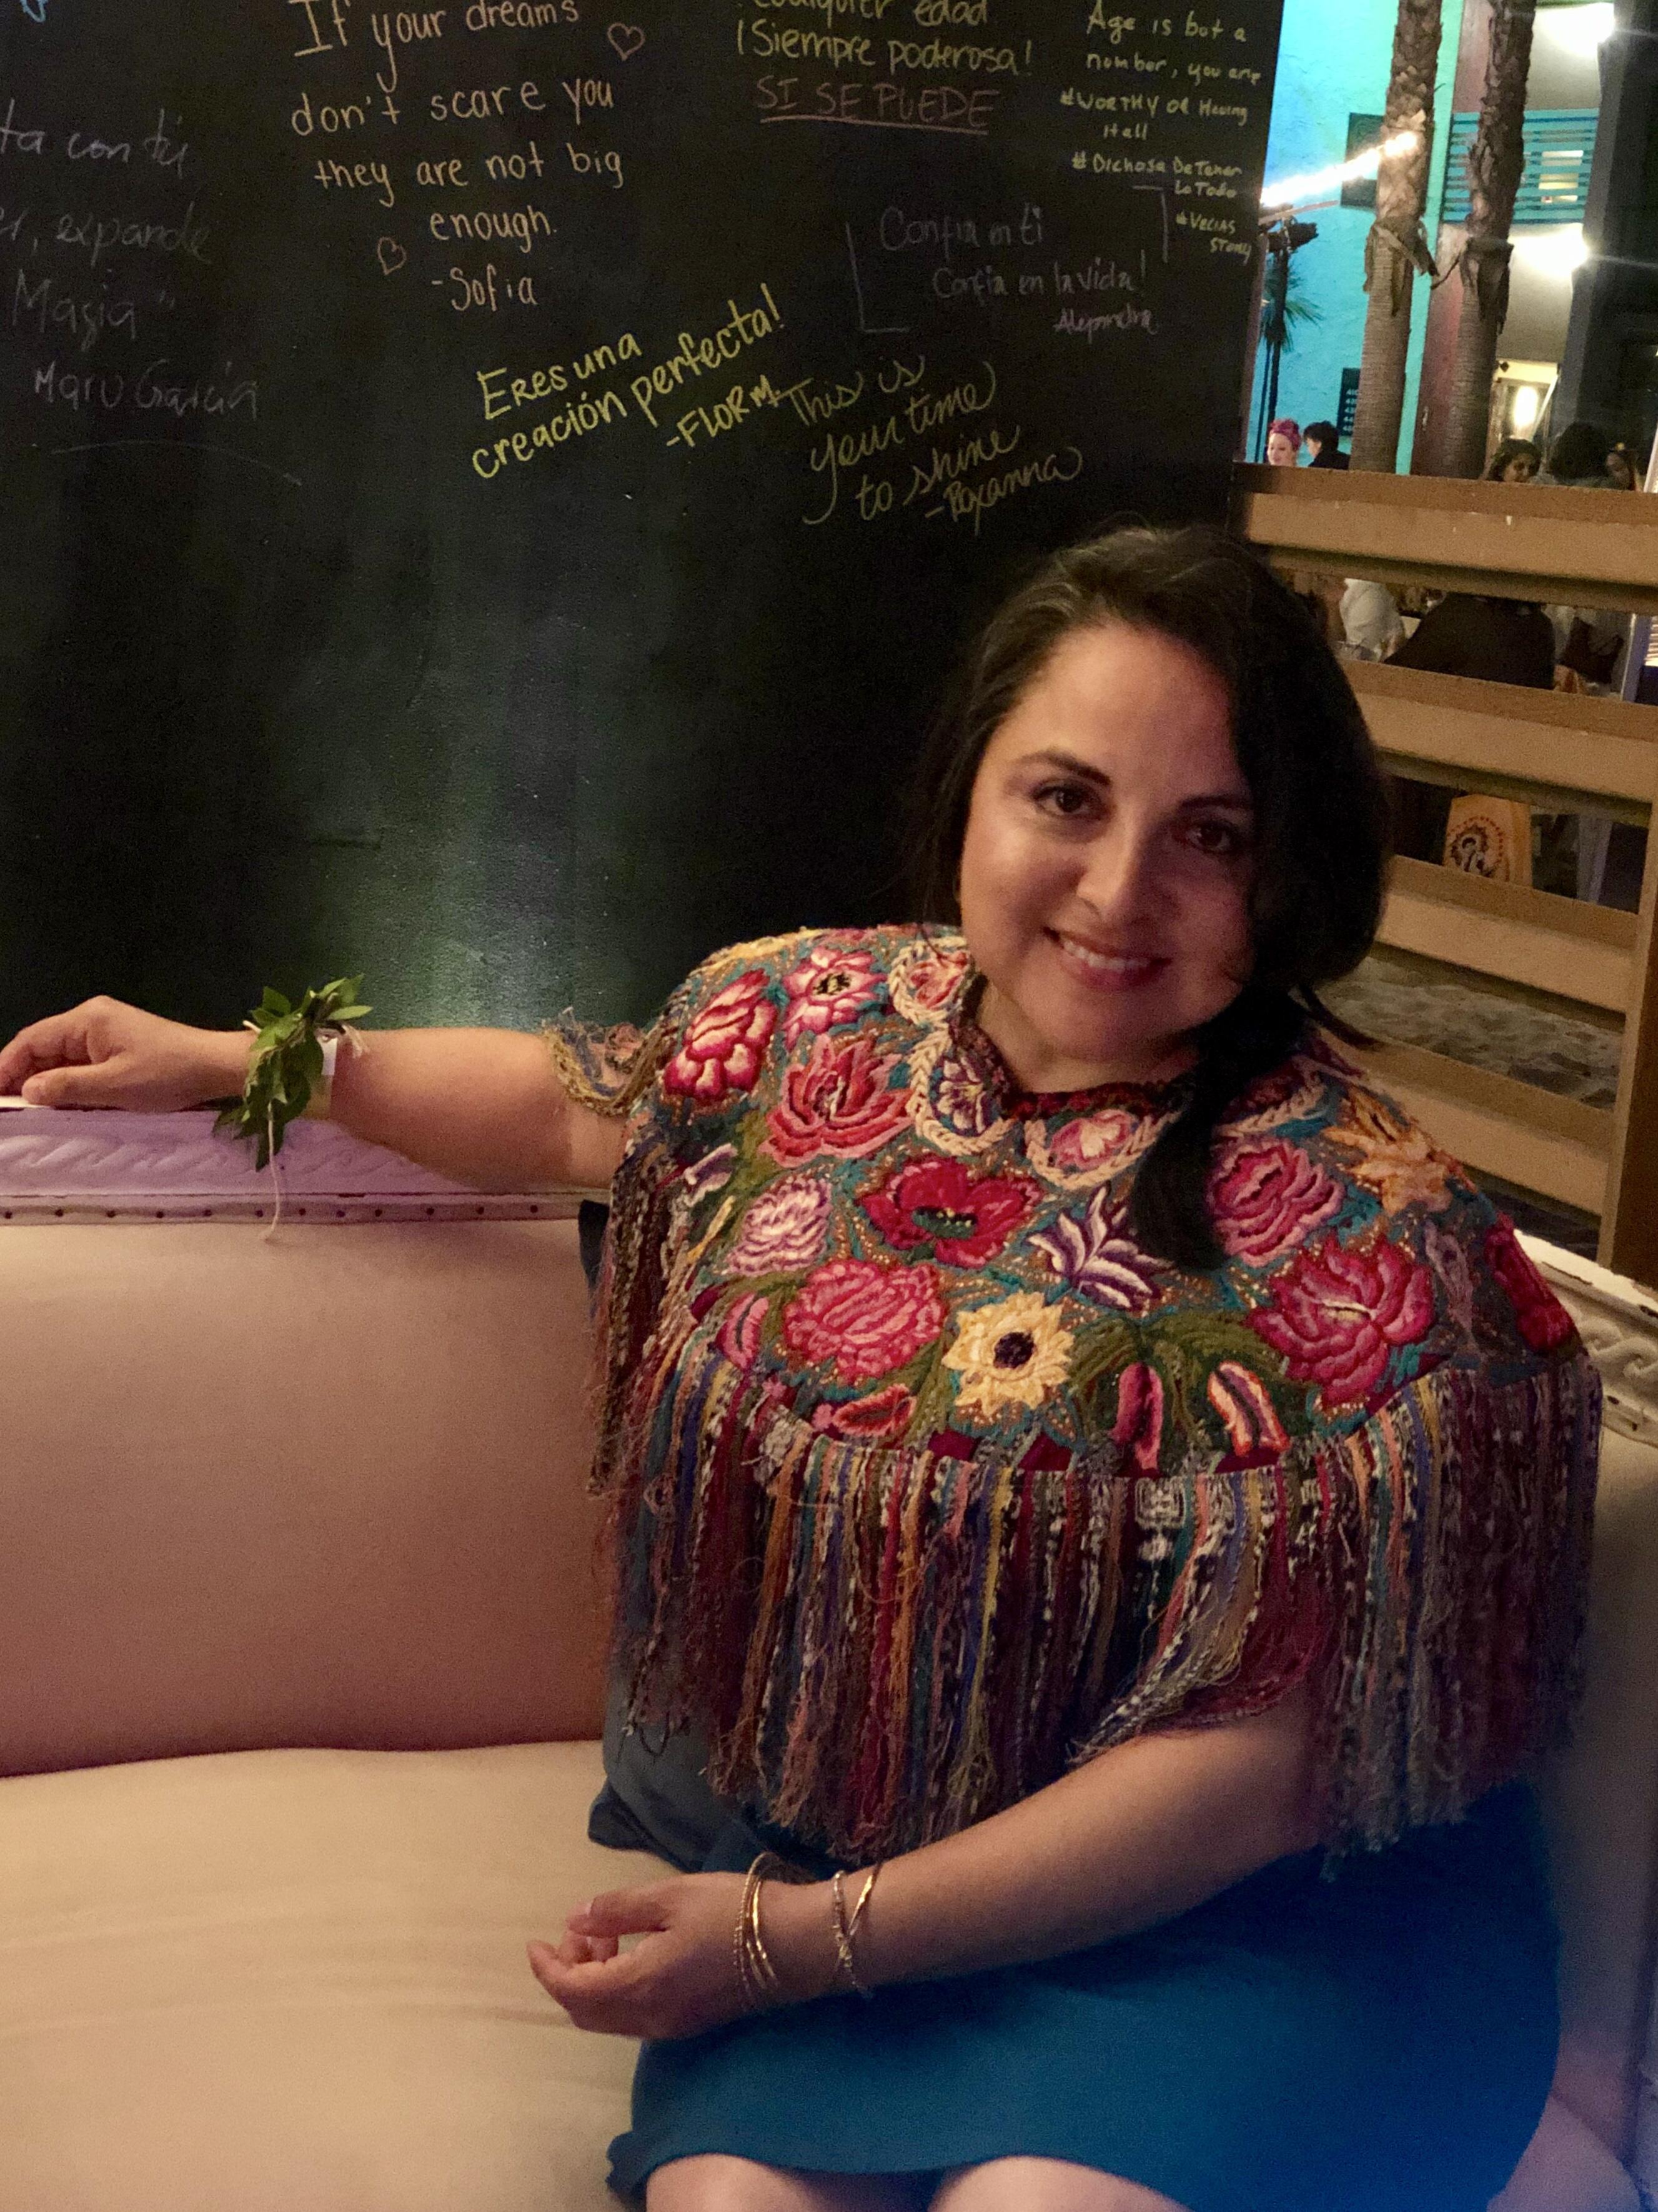 Woman sitting wearing a huipil